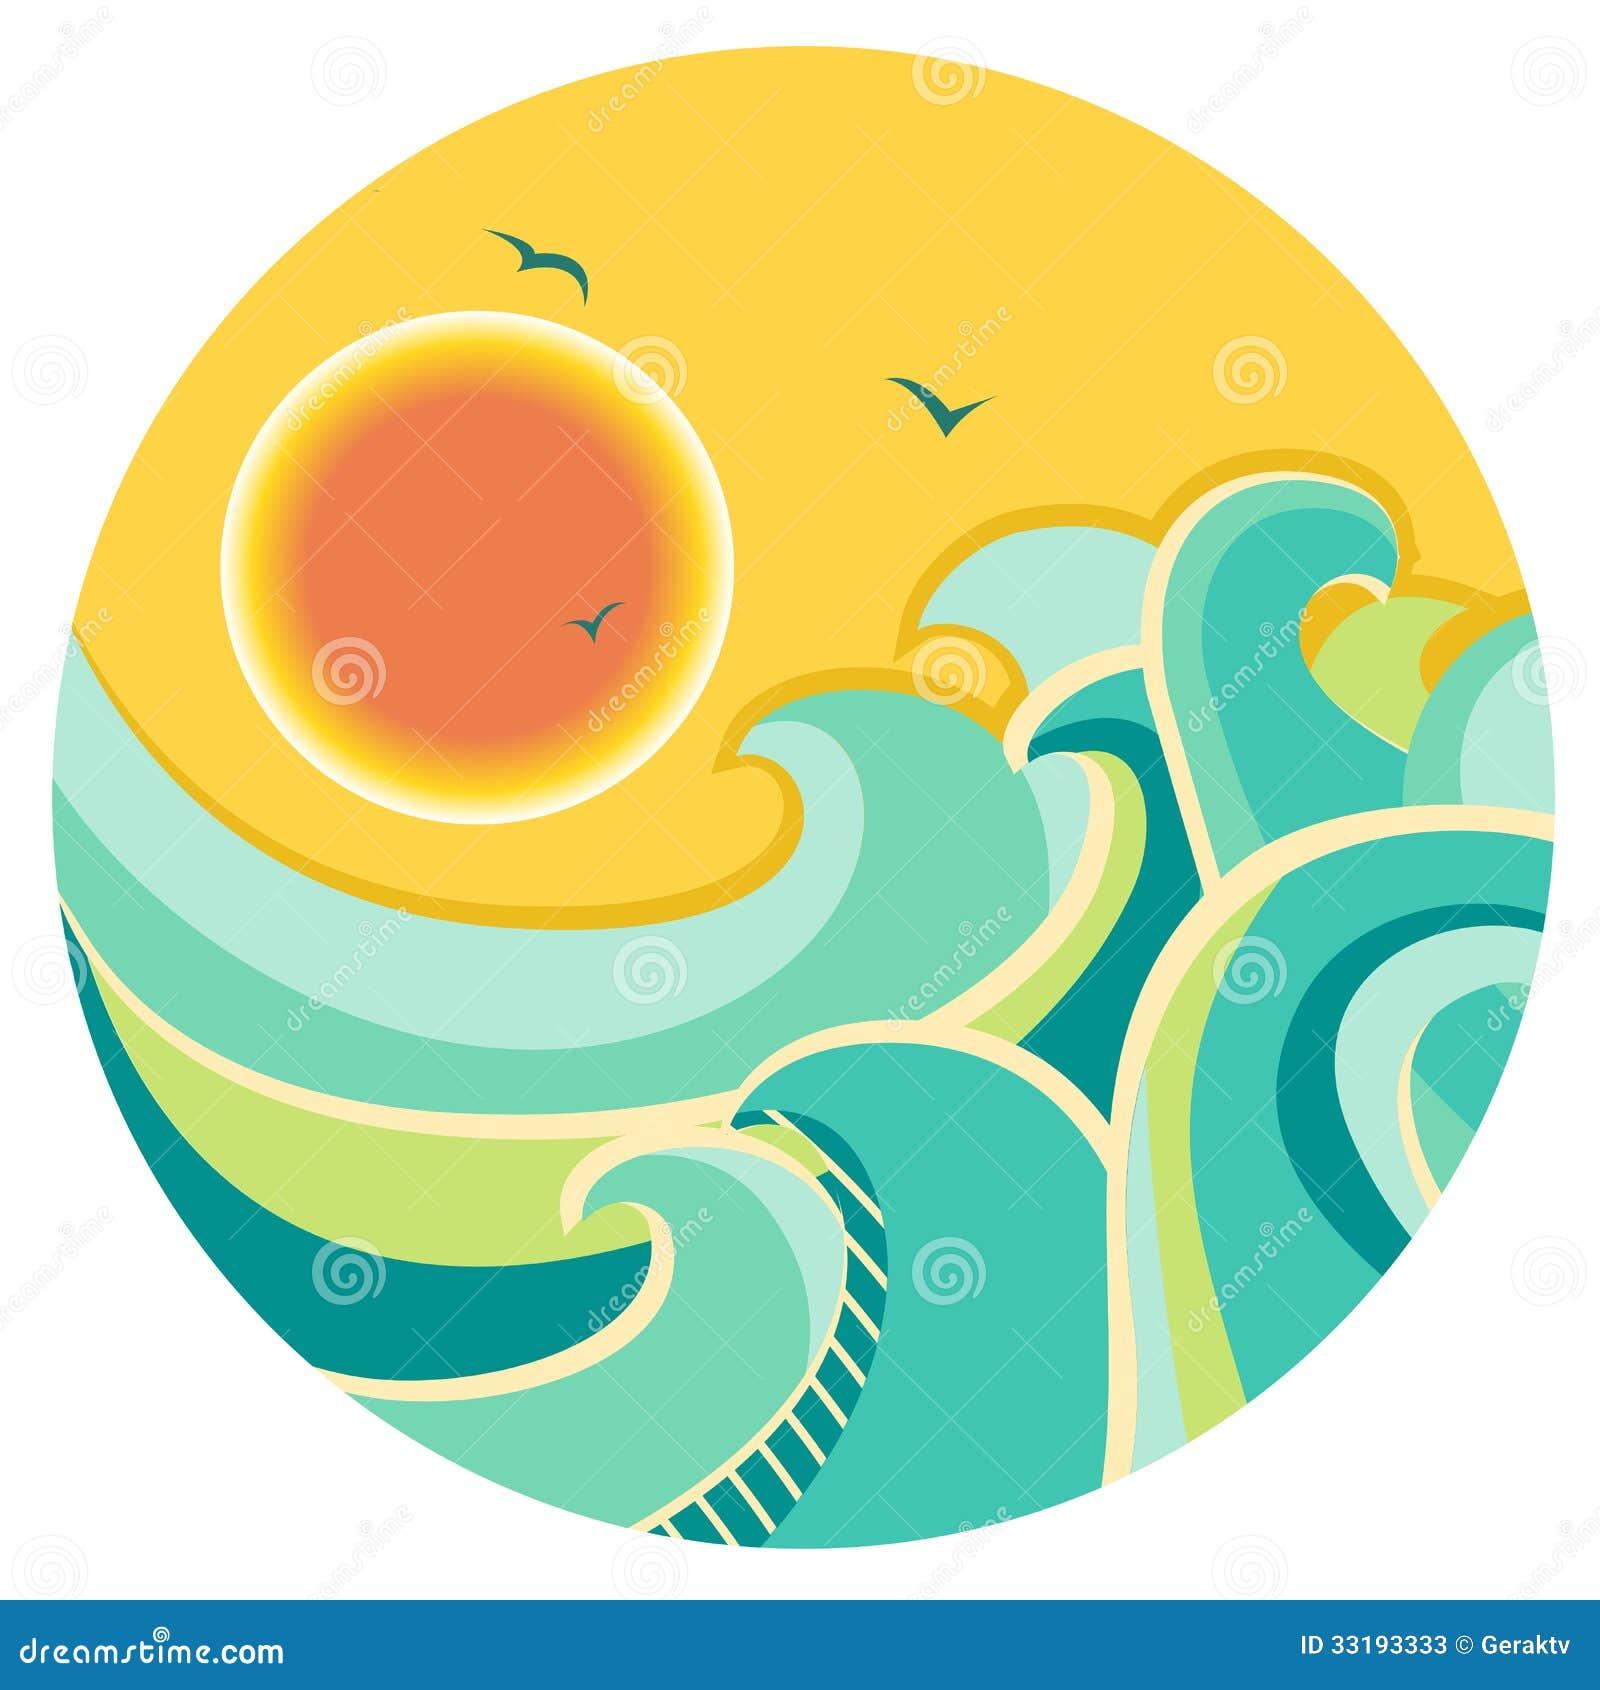 vintage color seascape with sun on round symbol stock. Black Bedroom Furniture Sets. Home Design Ideas